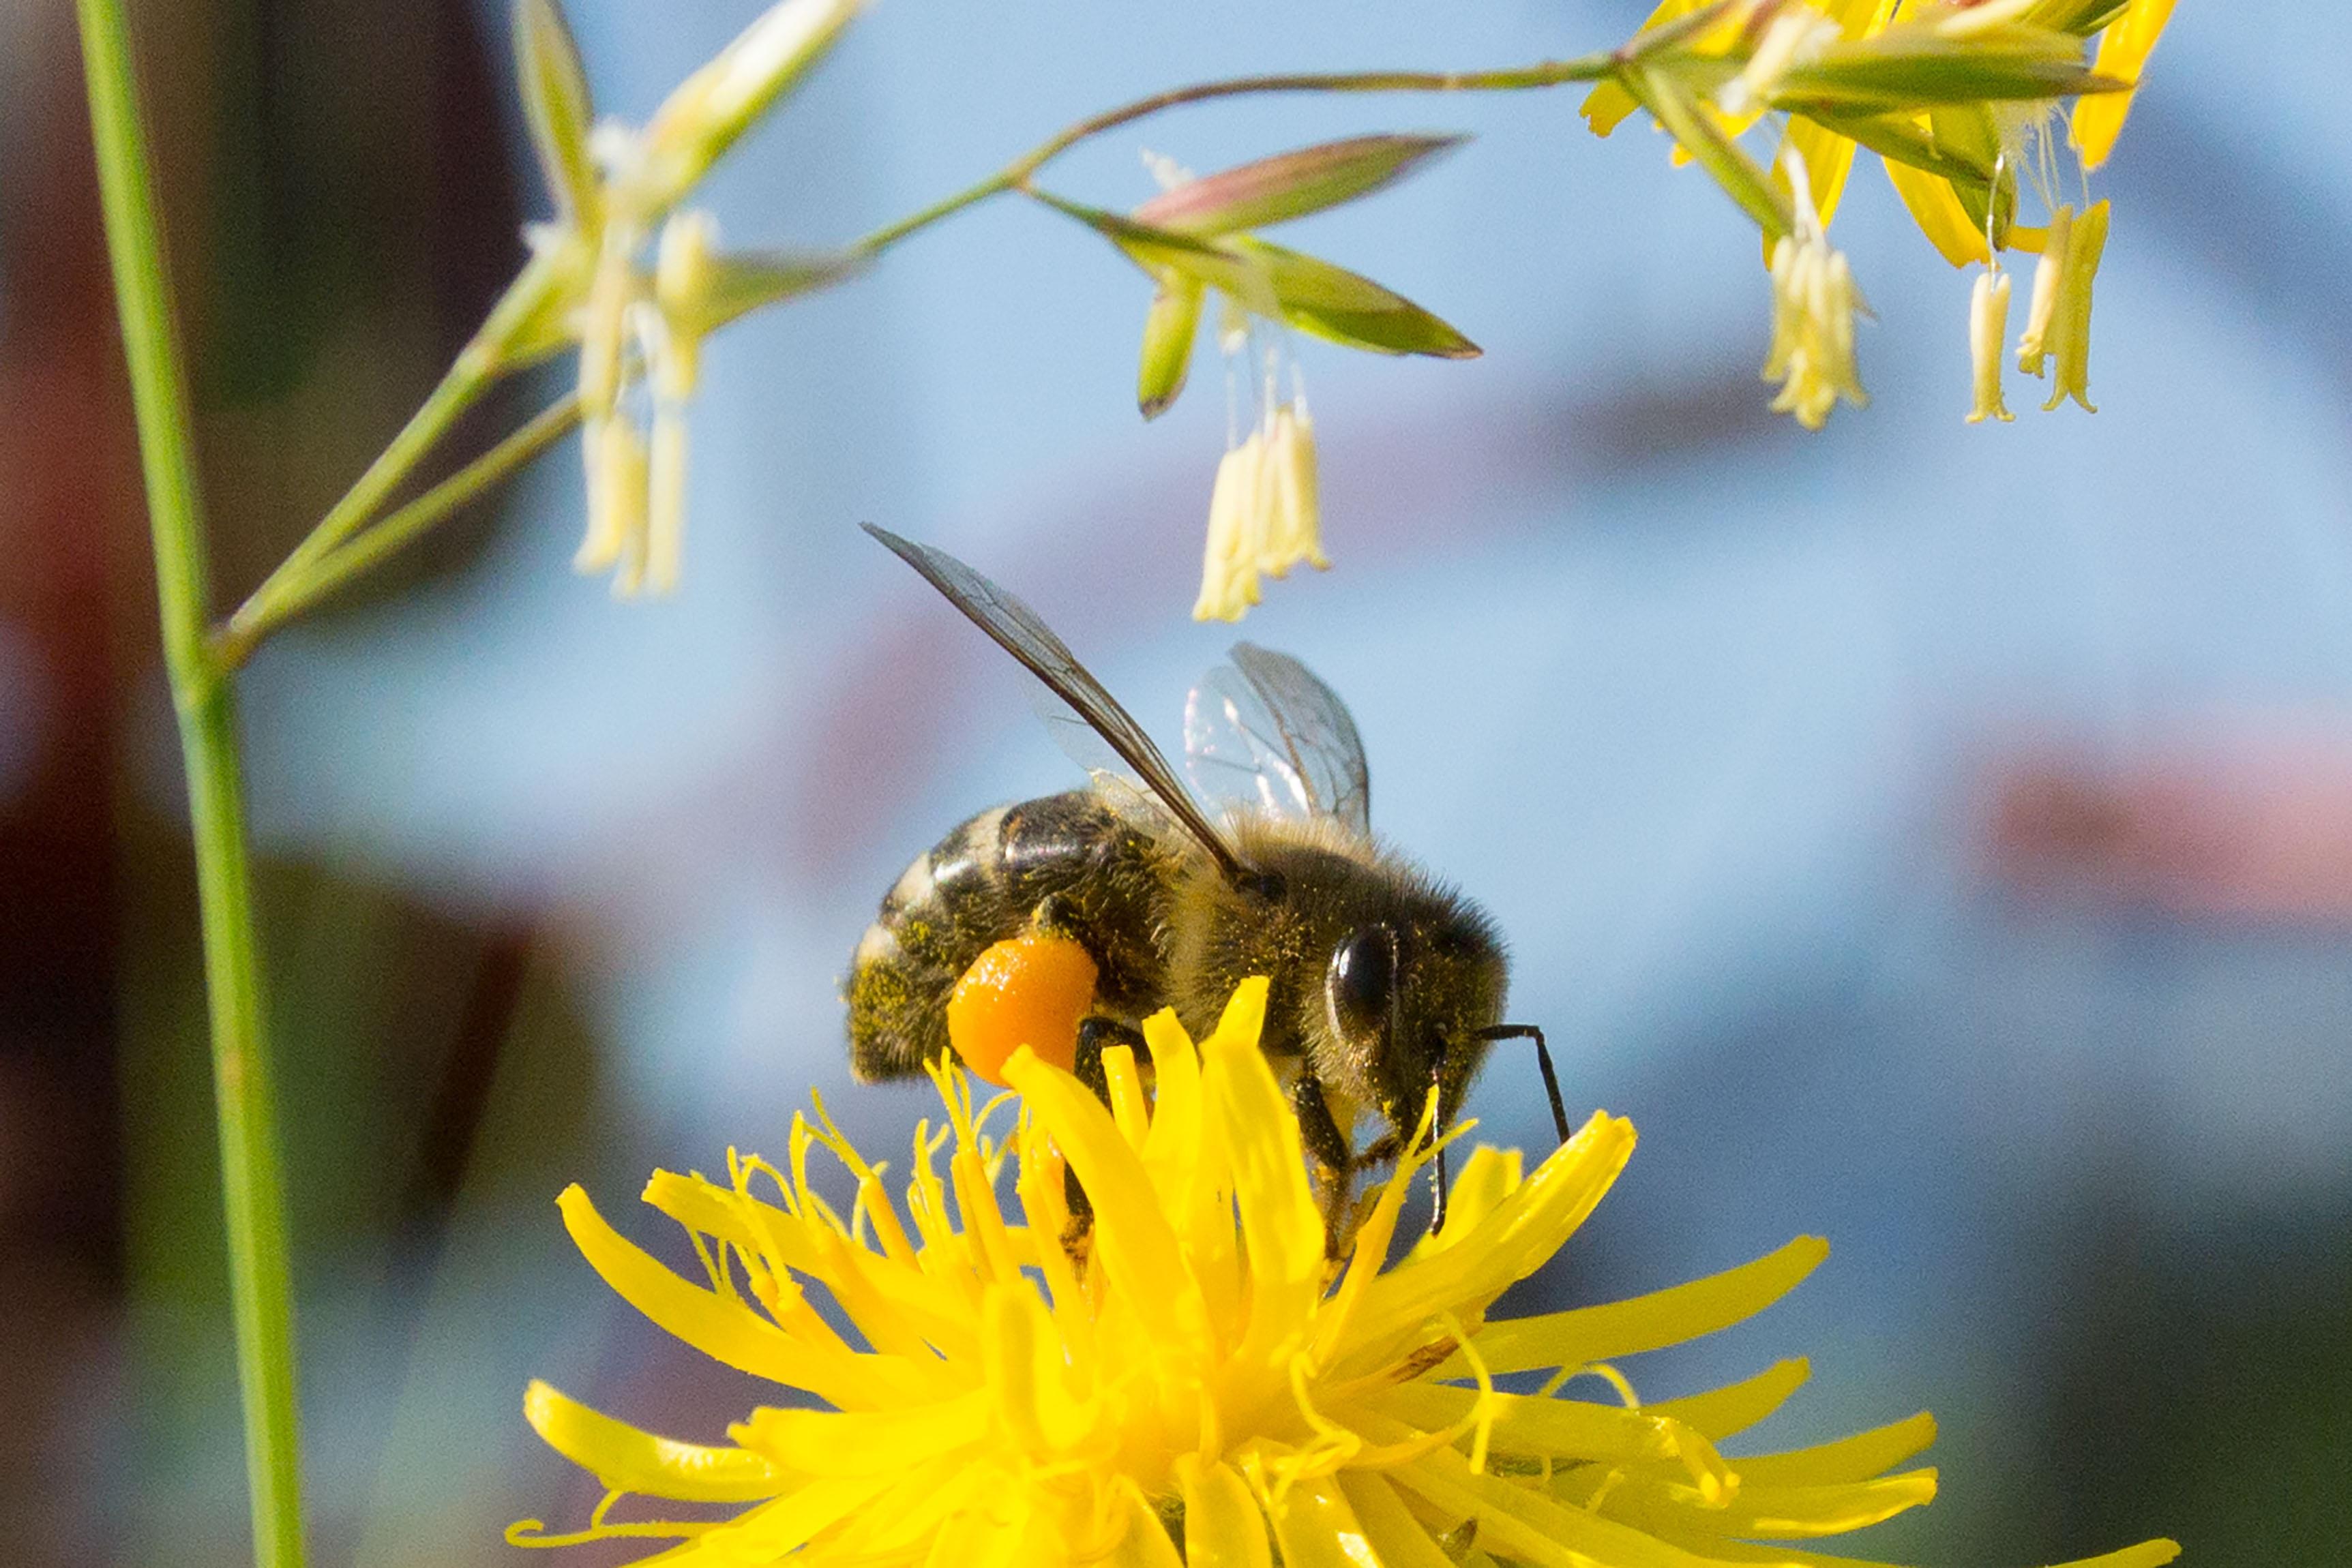 как пчелы в апреле носят мед фото темный